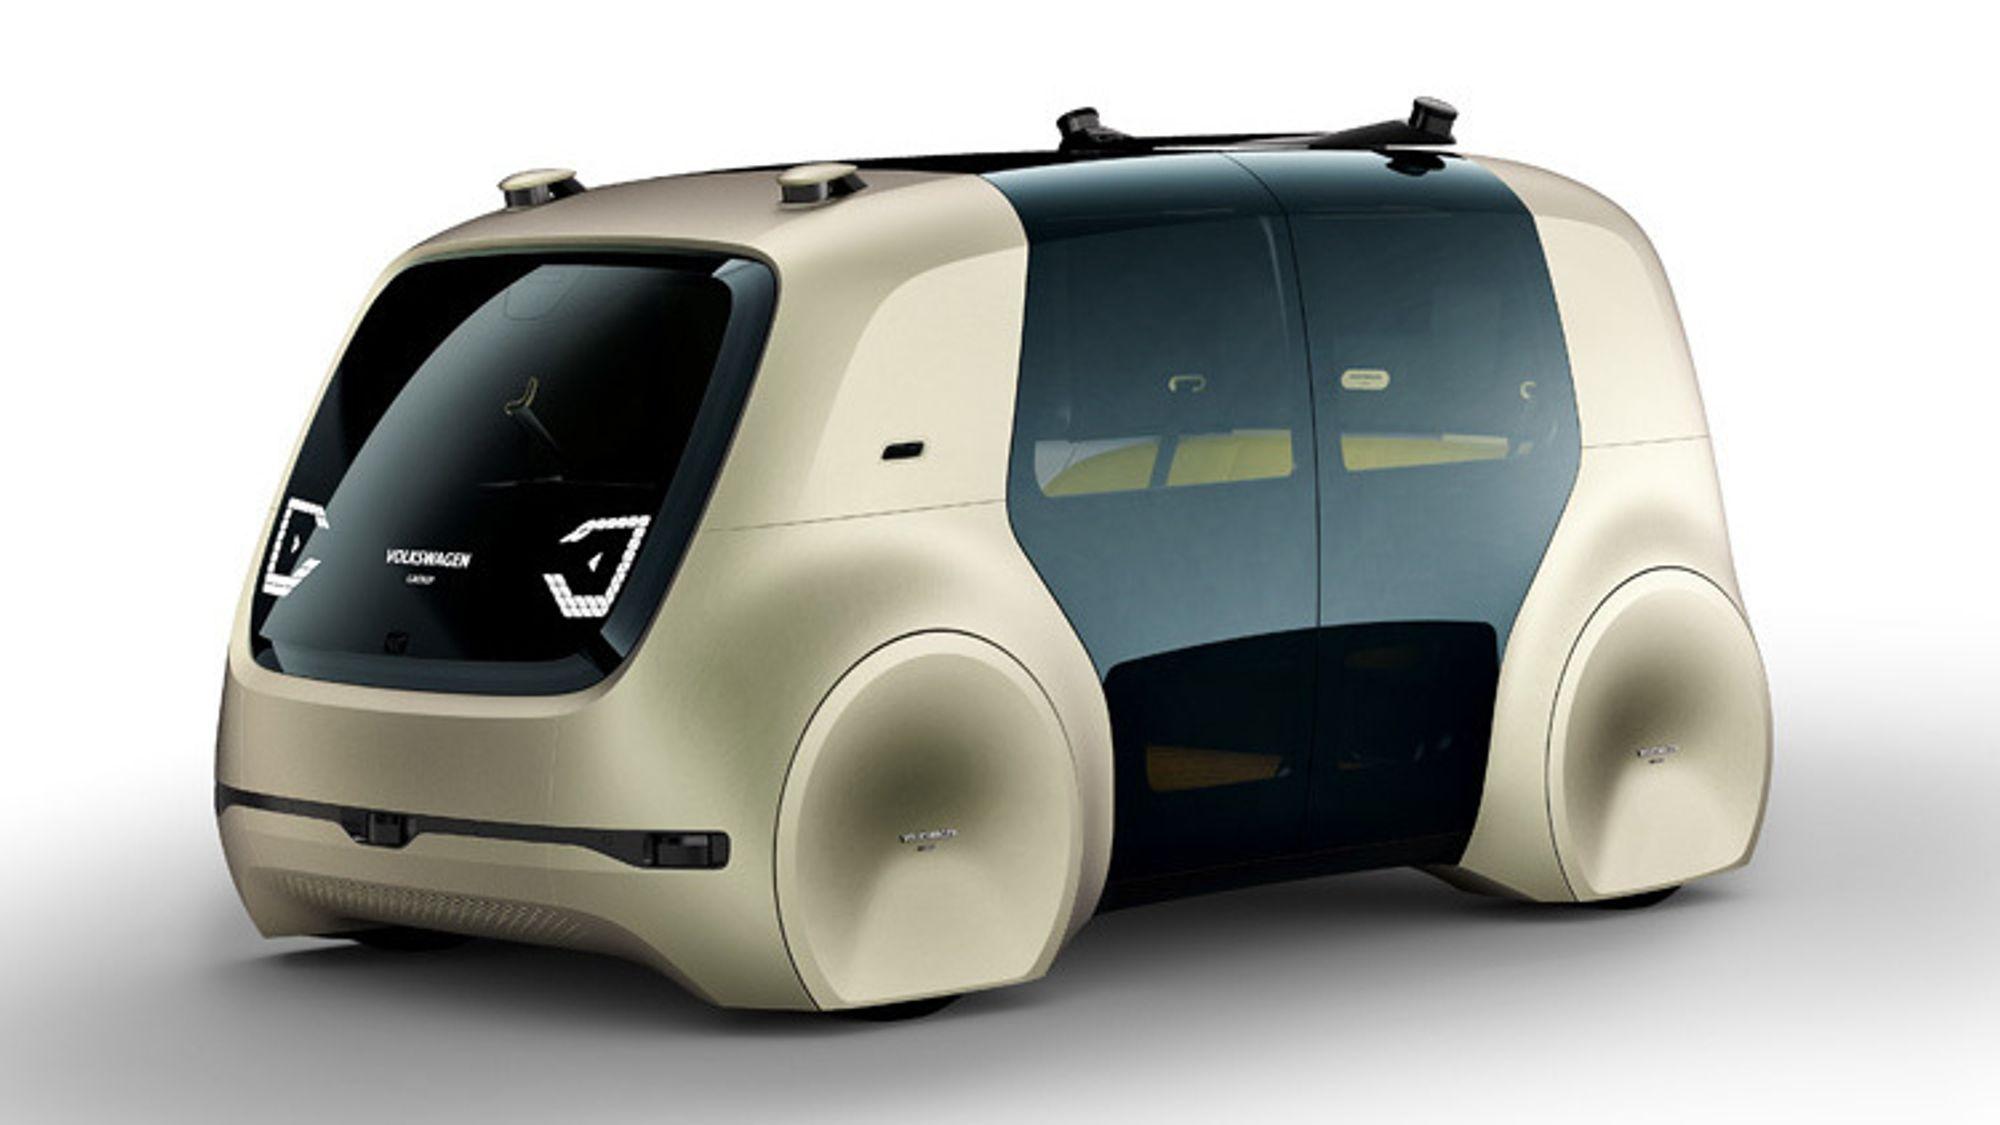 Volkswagen Sedric er en selvkjørende elektrisk minibuss. Dette er fremtidens transportmiddel, ifølge Volkswagen.